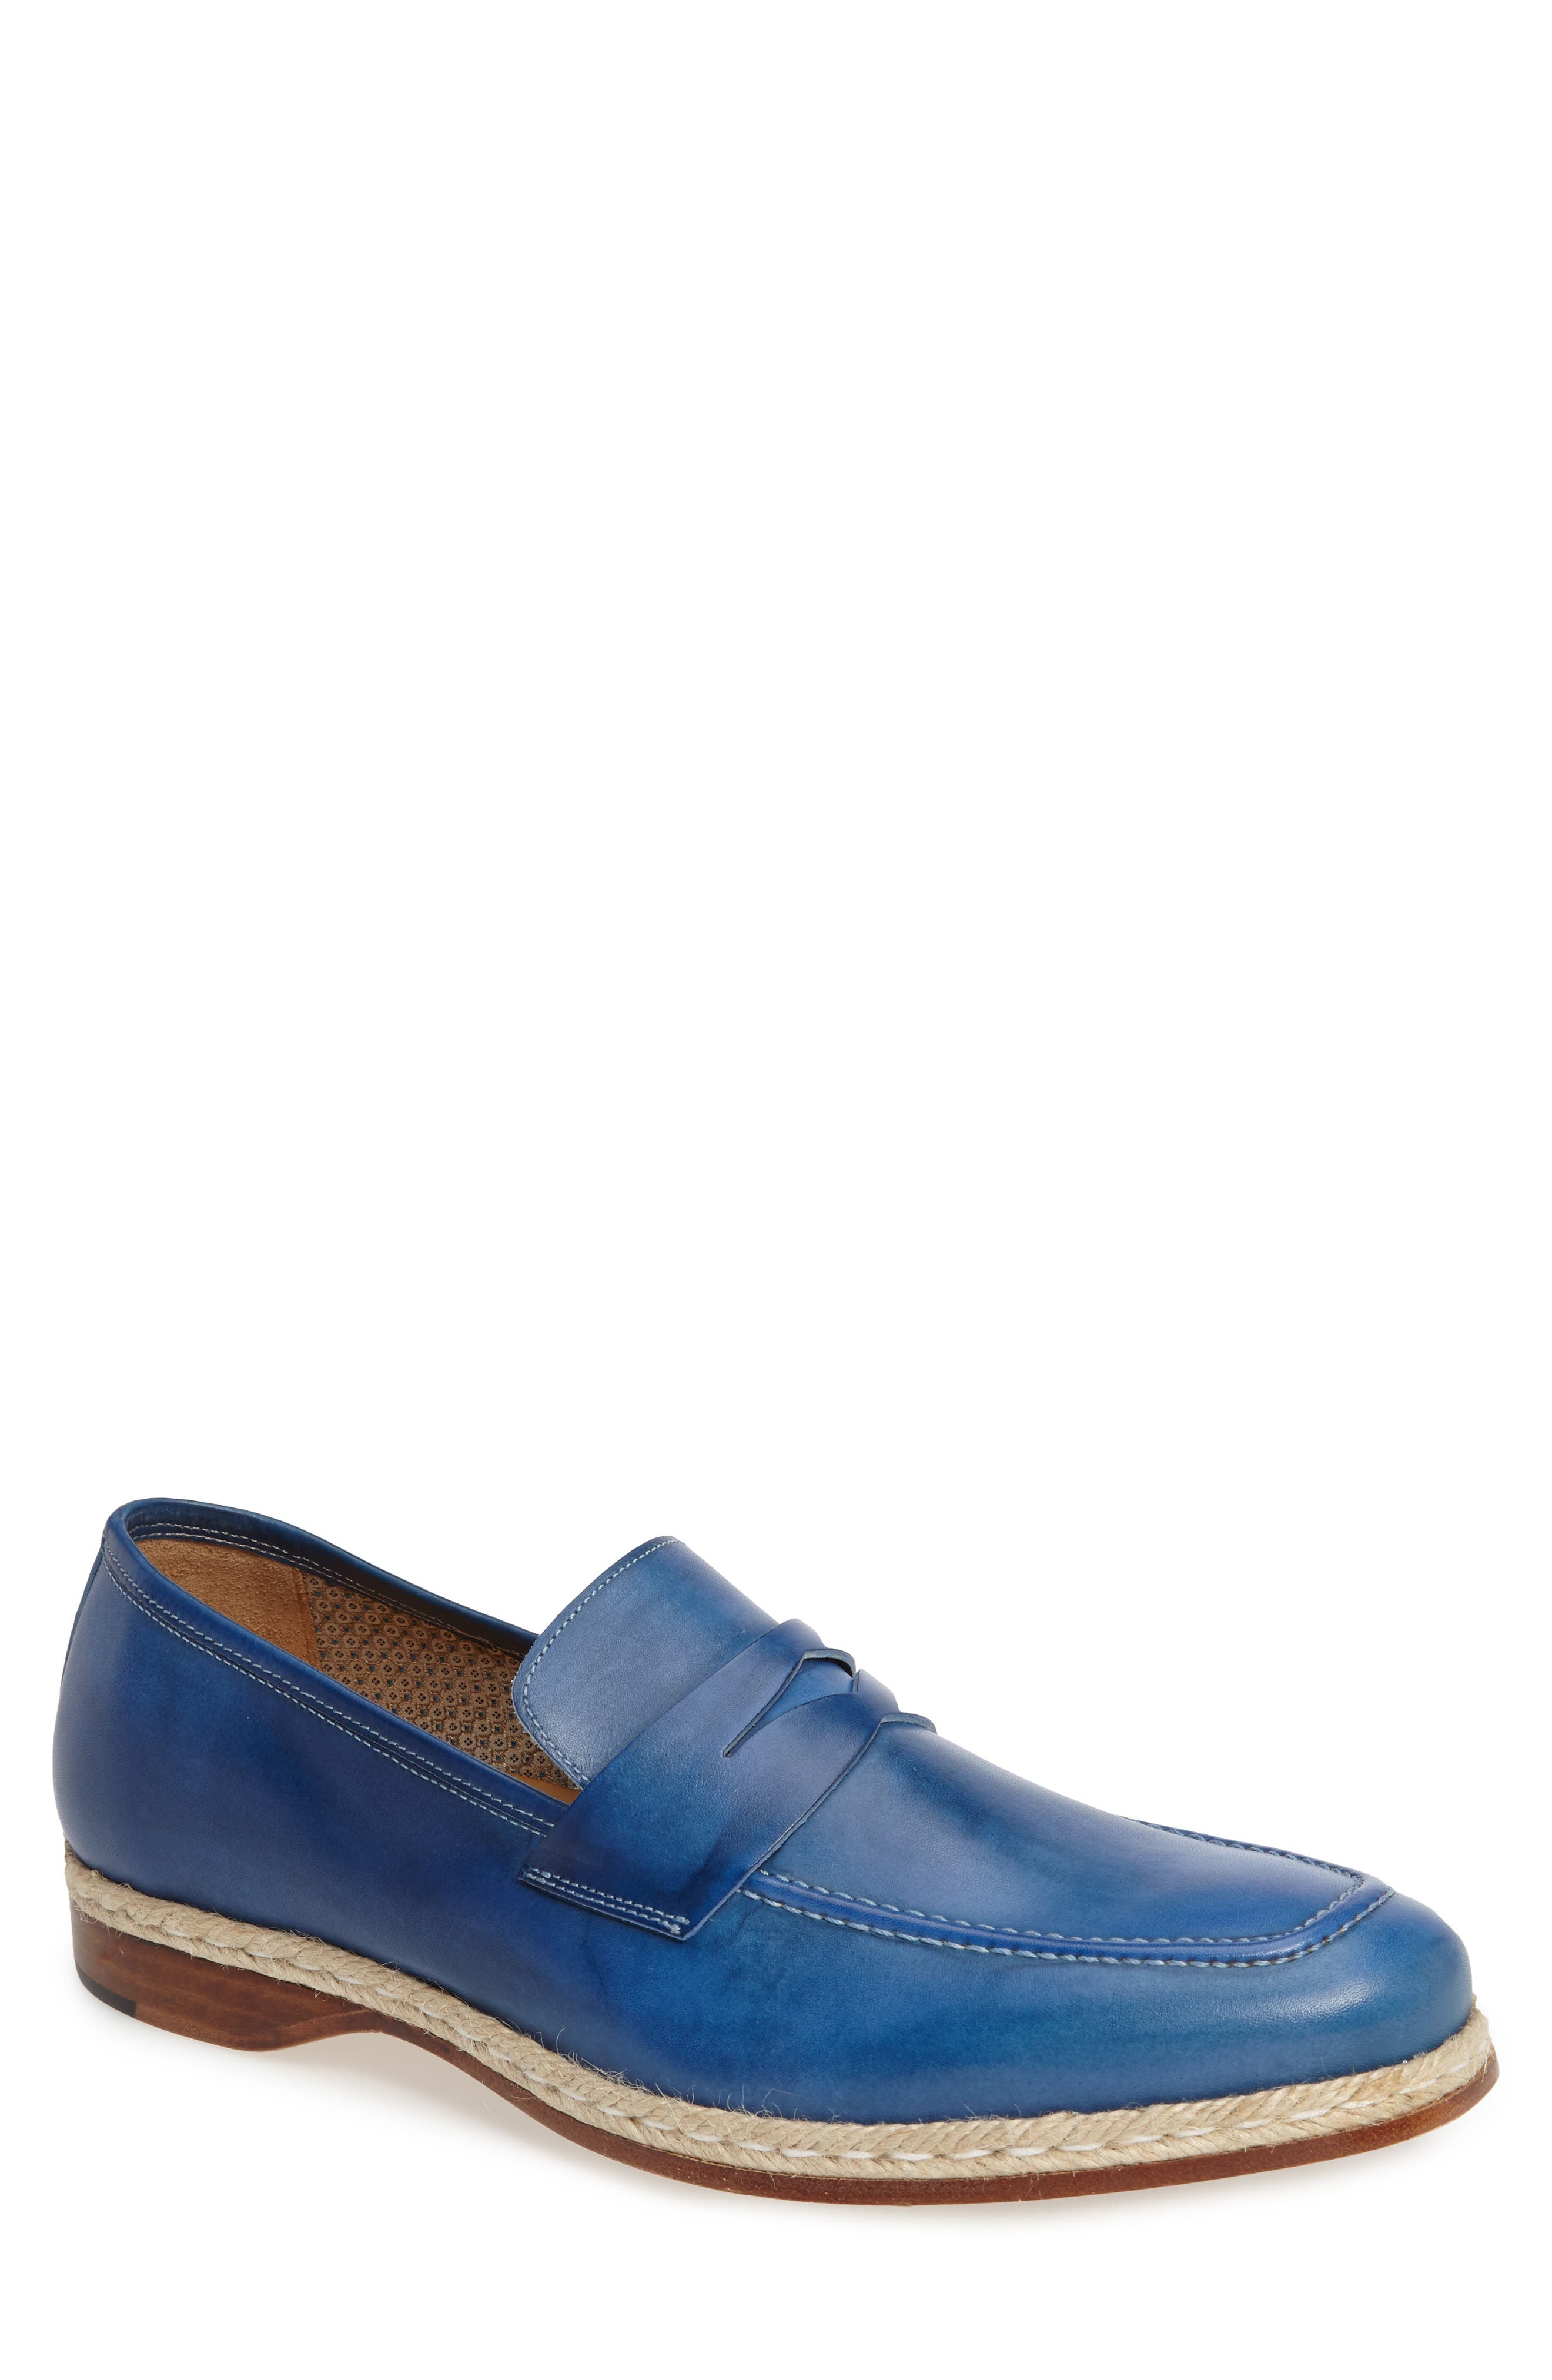 Battani Penny Loafer,                         Main,                         color, Blue Leather